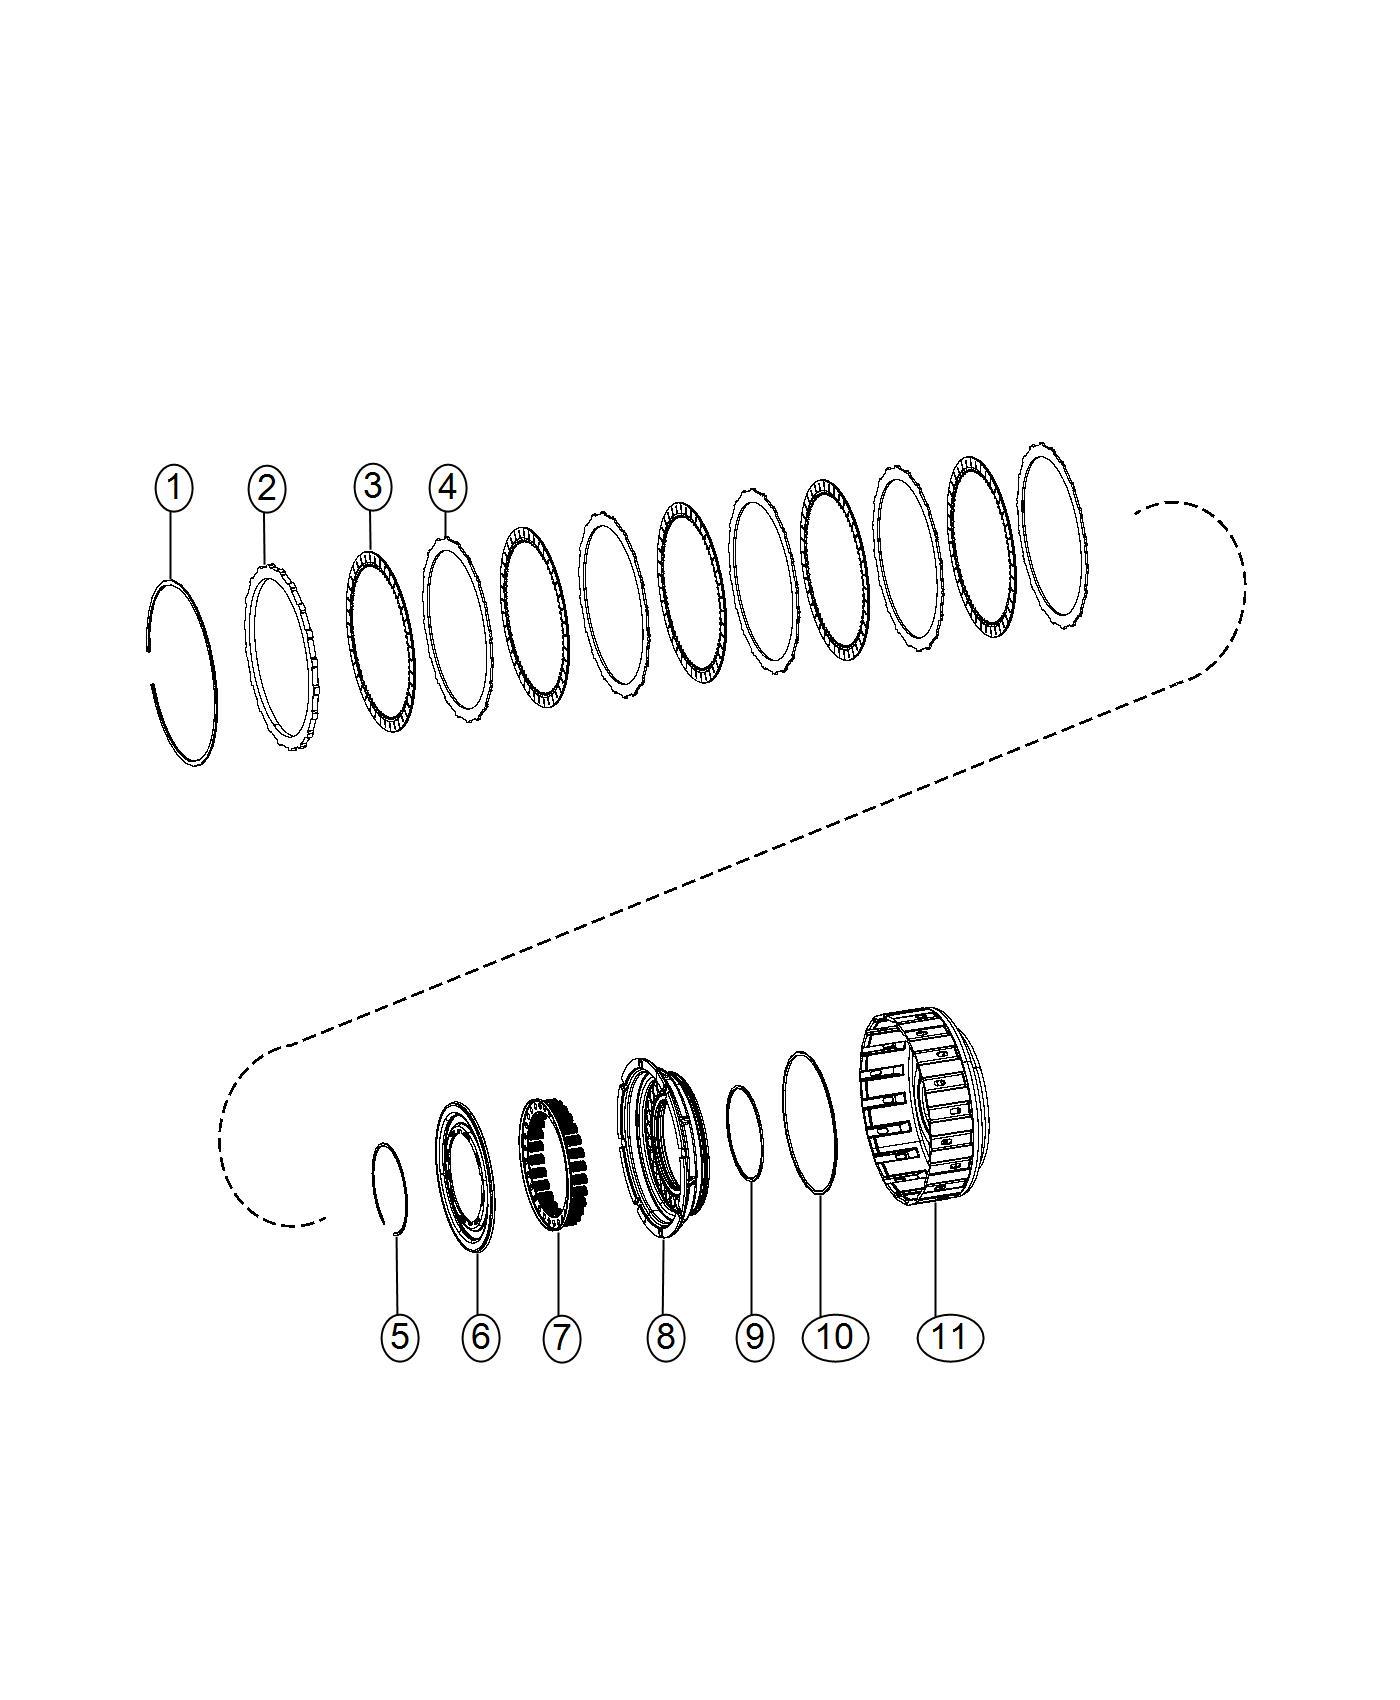 Ram 3500 Plate  Clutch Separator  Transmission O  Drive